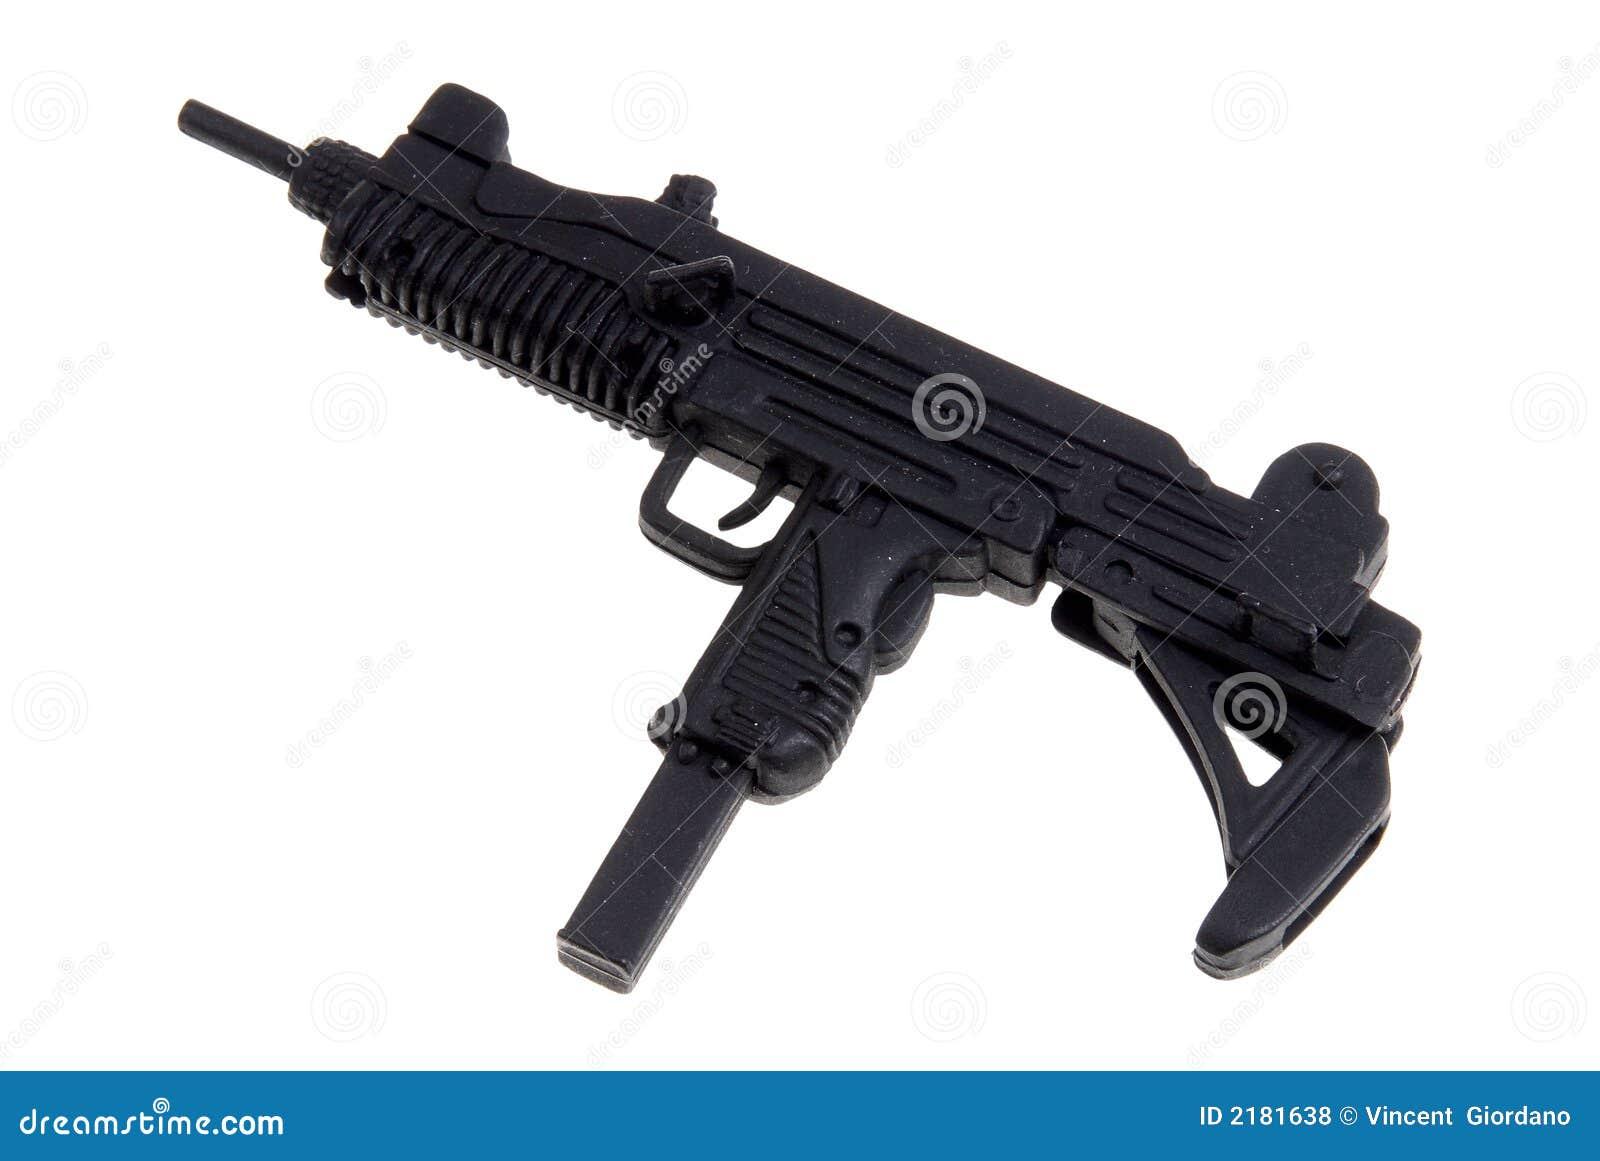 play machine gun